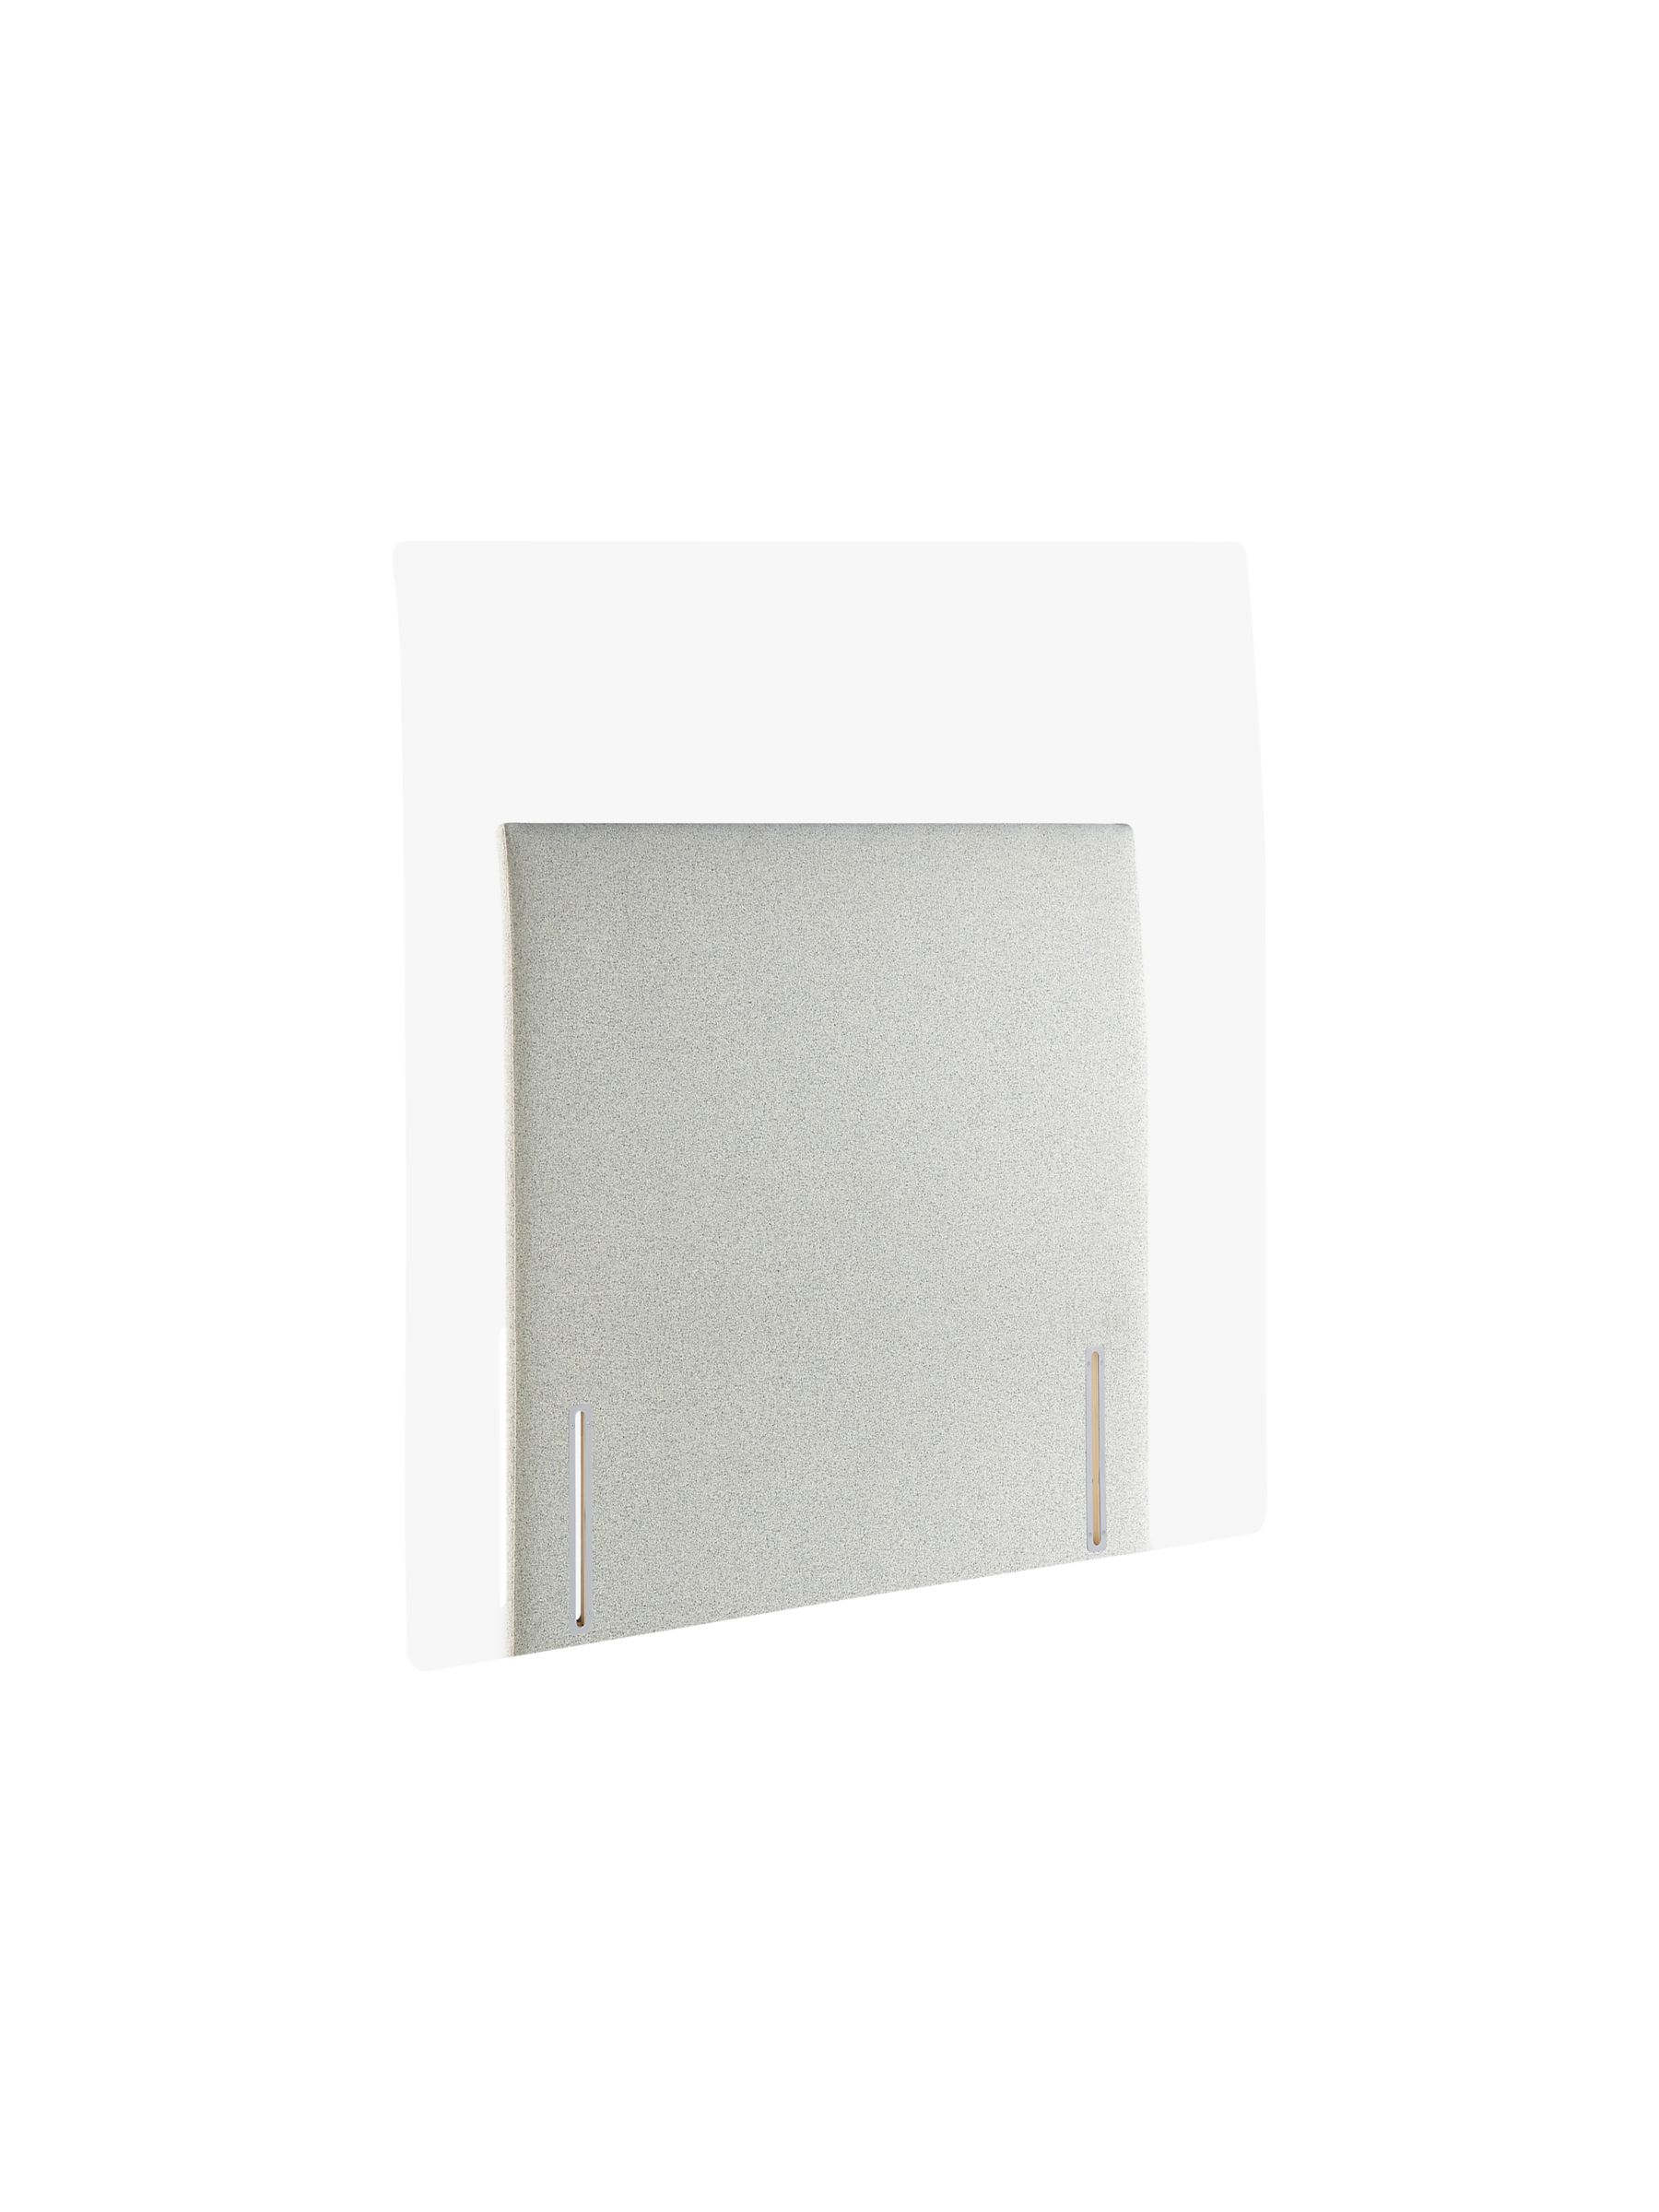 John Lewis & Partners Bedford Full Depth Upholstered Headboard, Single, FSC Certified (Softwood)